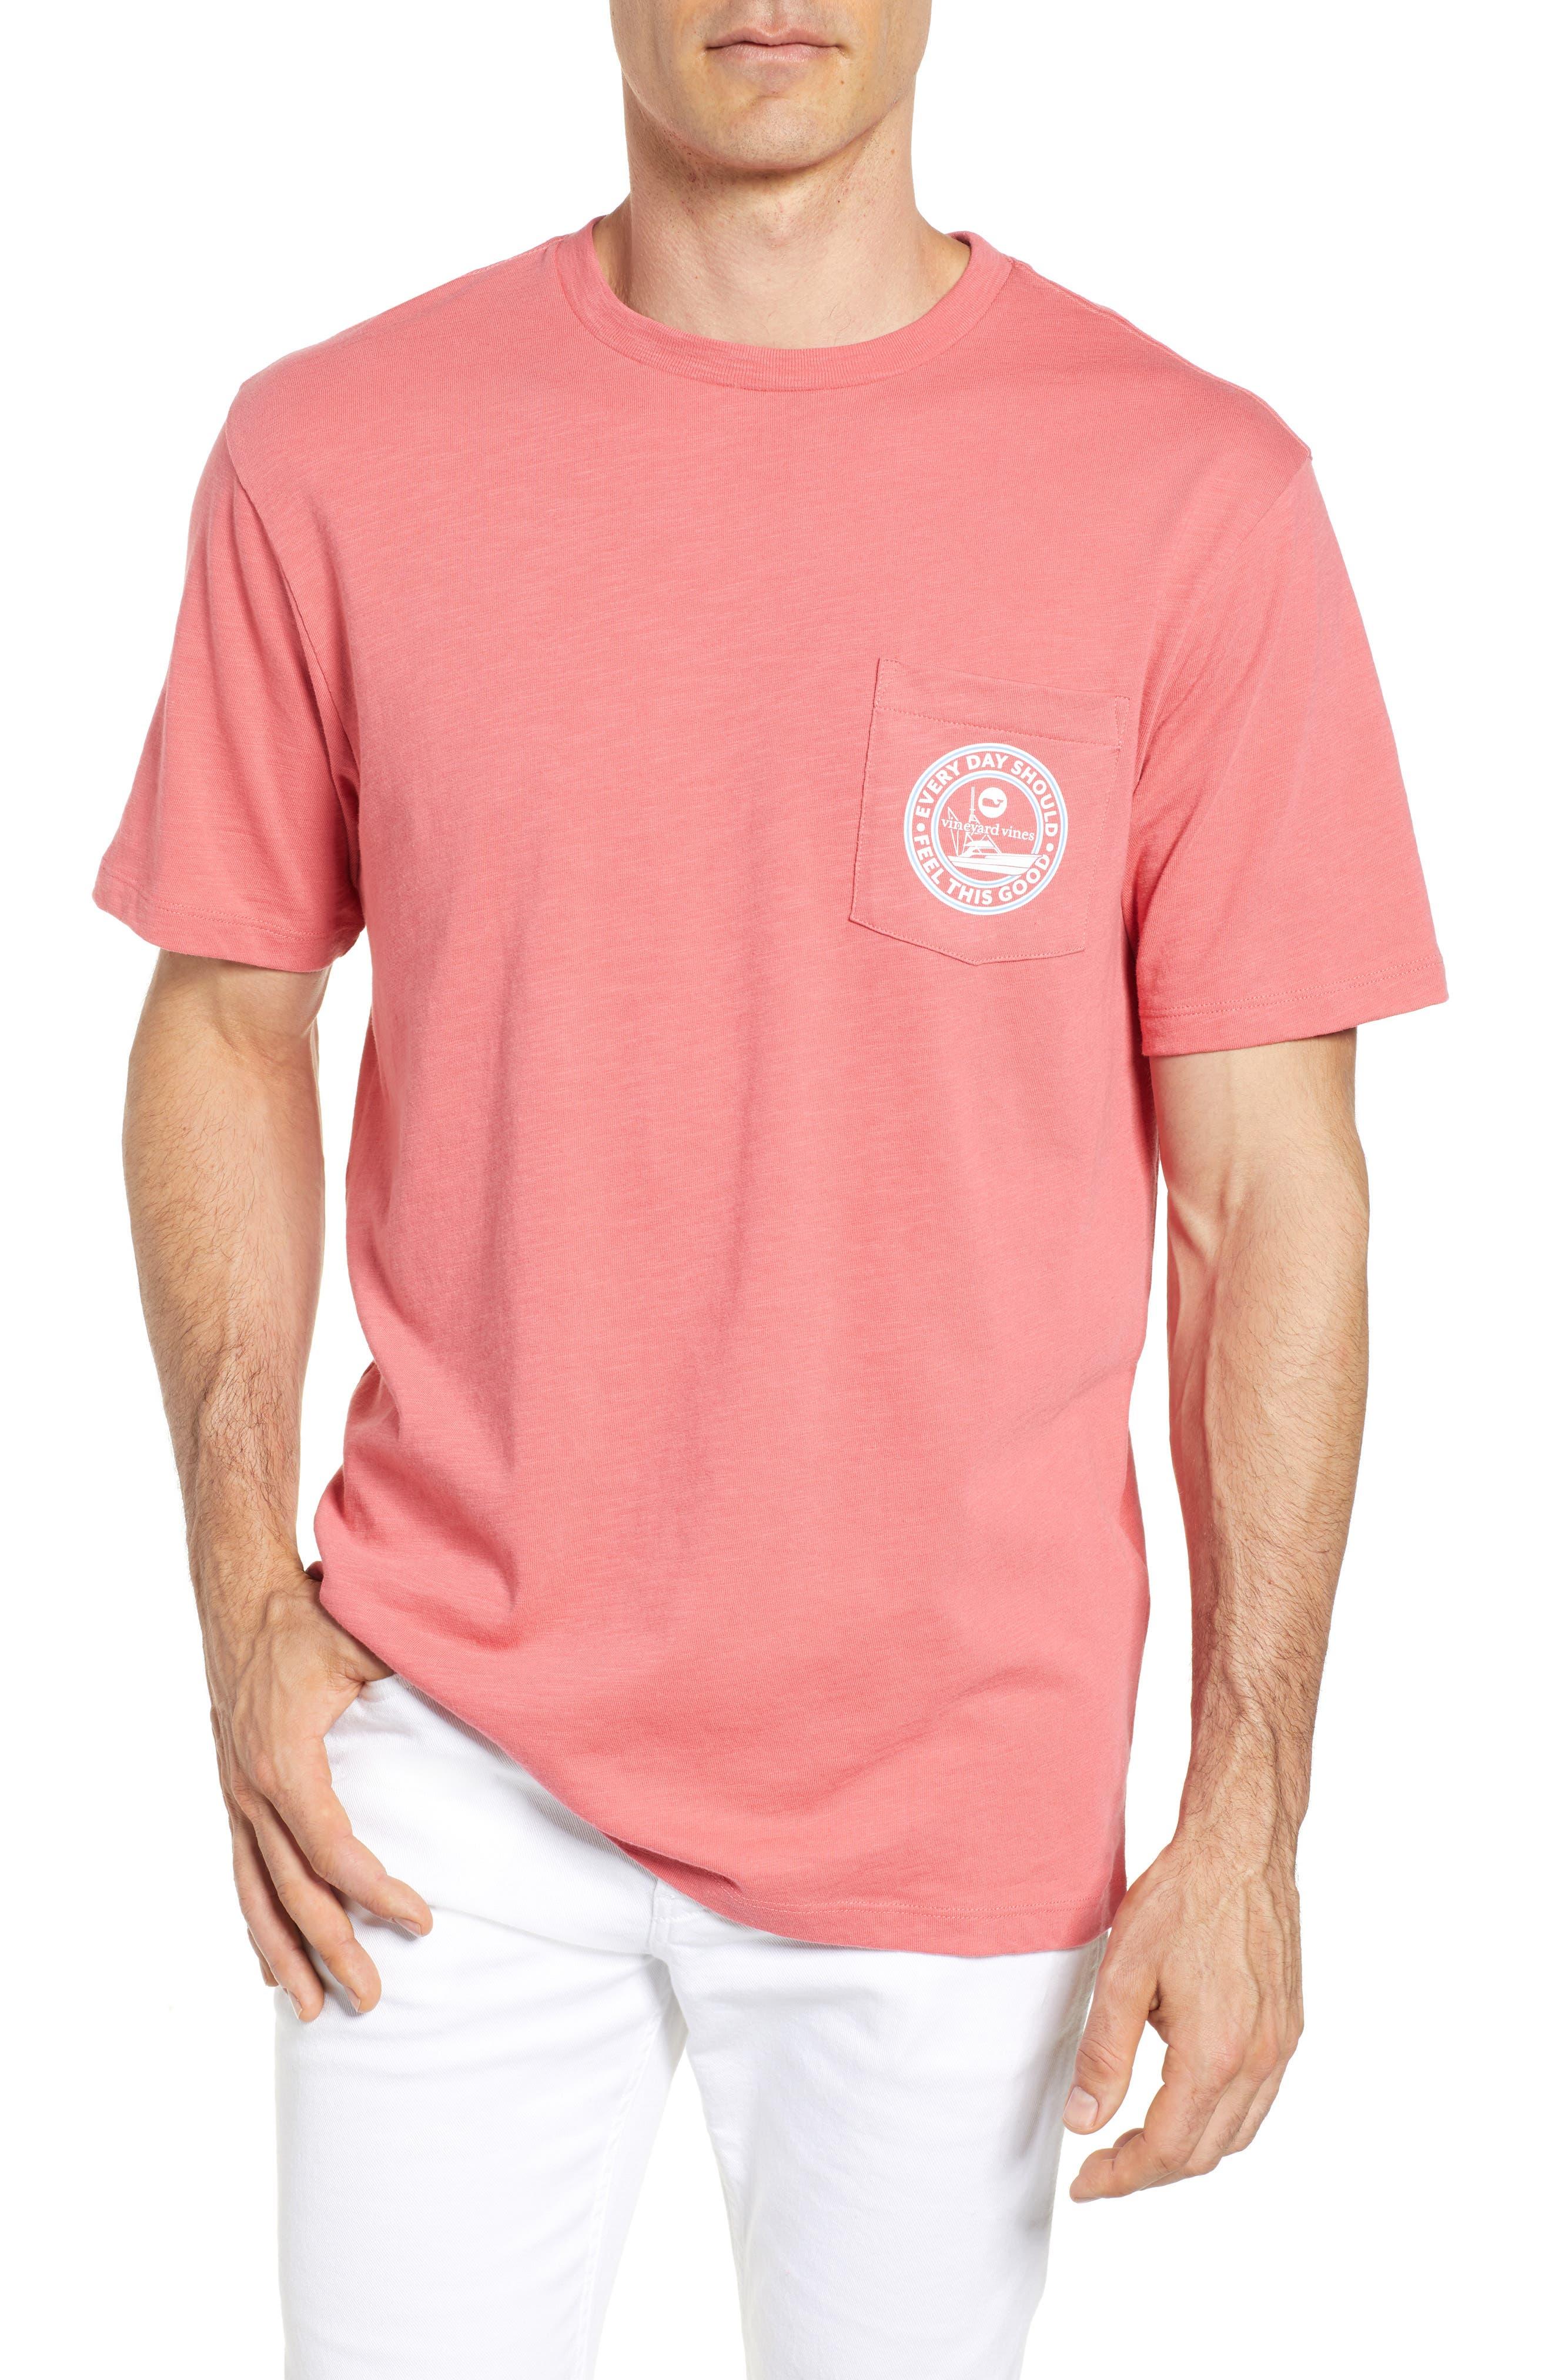 Every Day Should Feel This Good Pocket T-Shirt,                             Main thumbnail 1, color,                             628